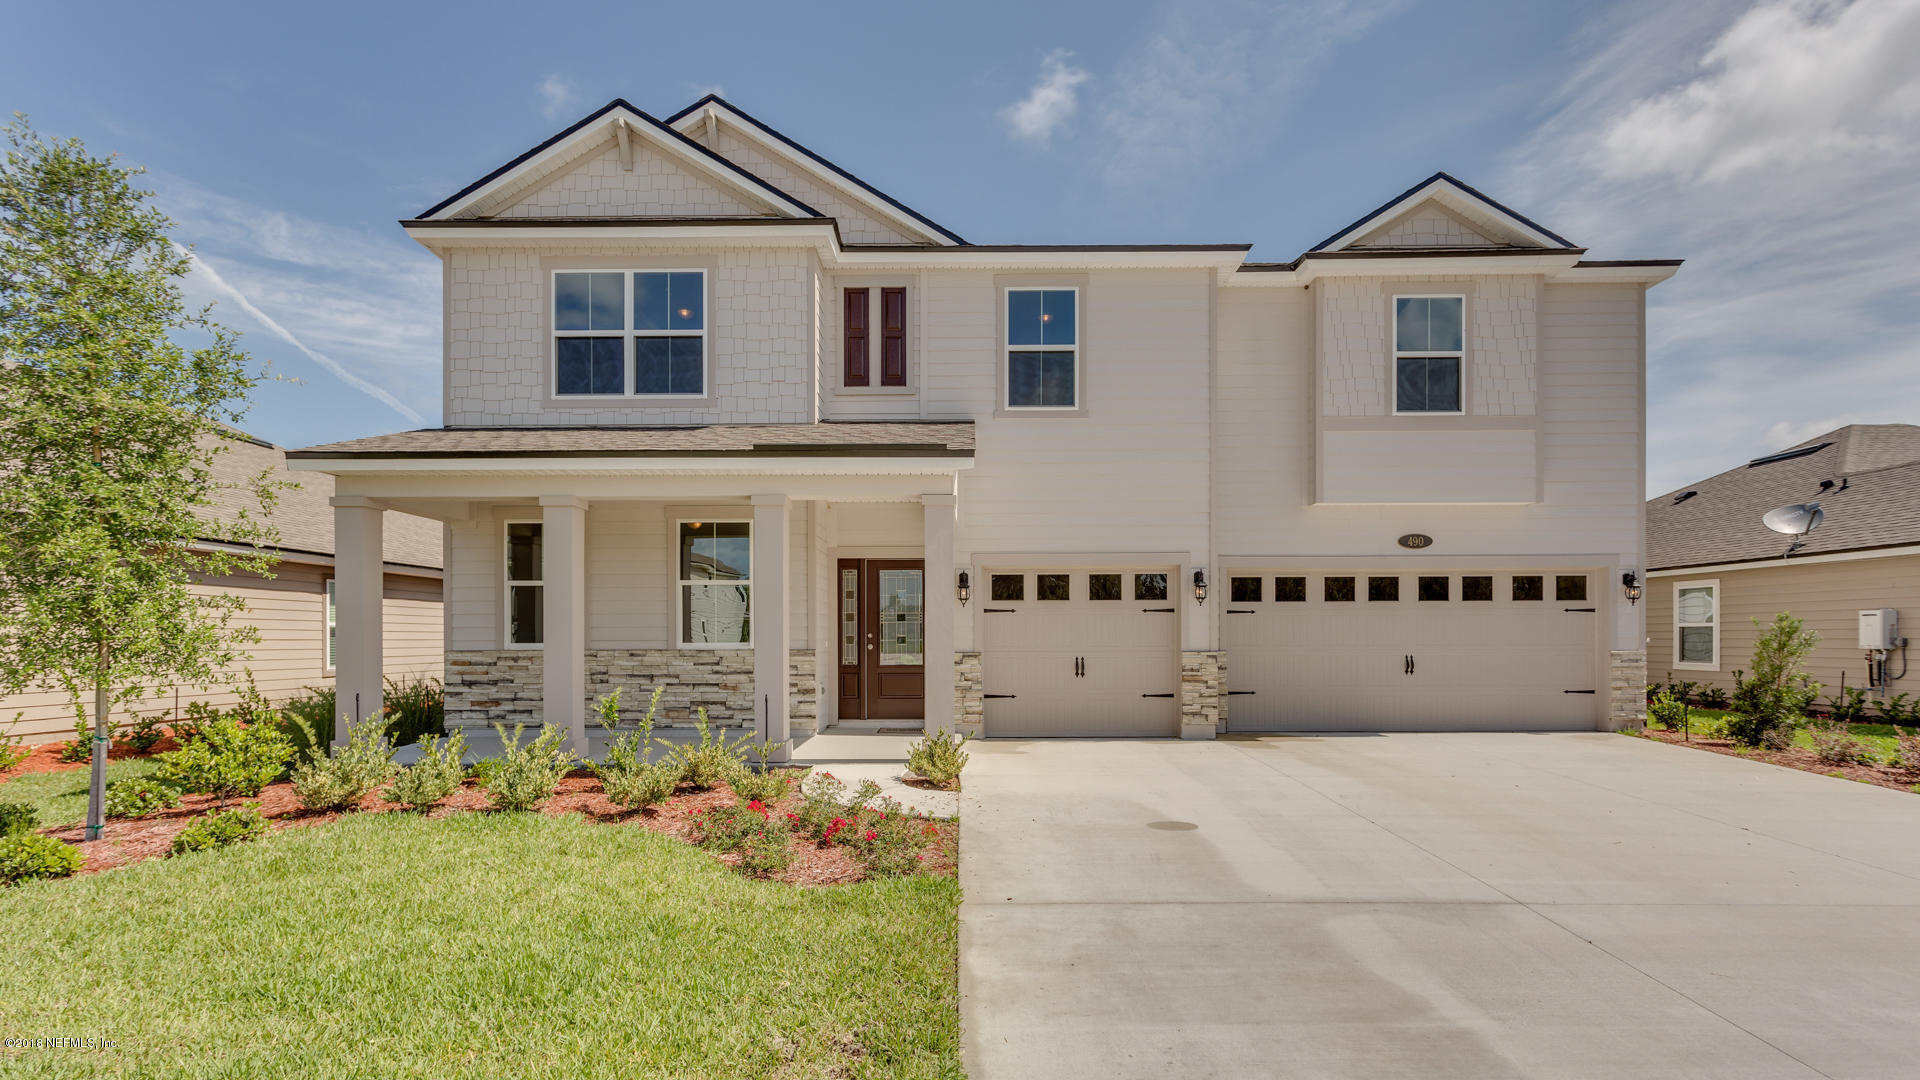 490 SPLIT OAK, ST AUGUSTINE, FLORIDA 32092, 5 Bedrooms Bedrooms, ,3 BathroomsBathrooms,Residential - single family,For sale,SPLIT OAK,895602